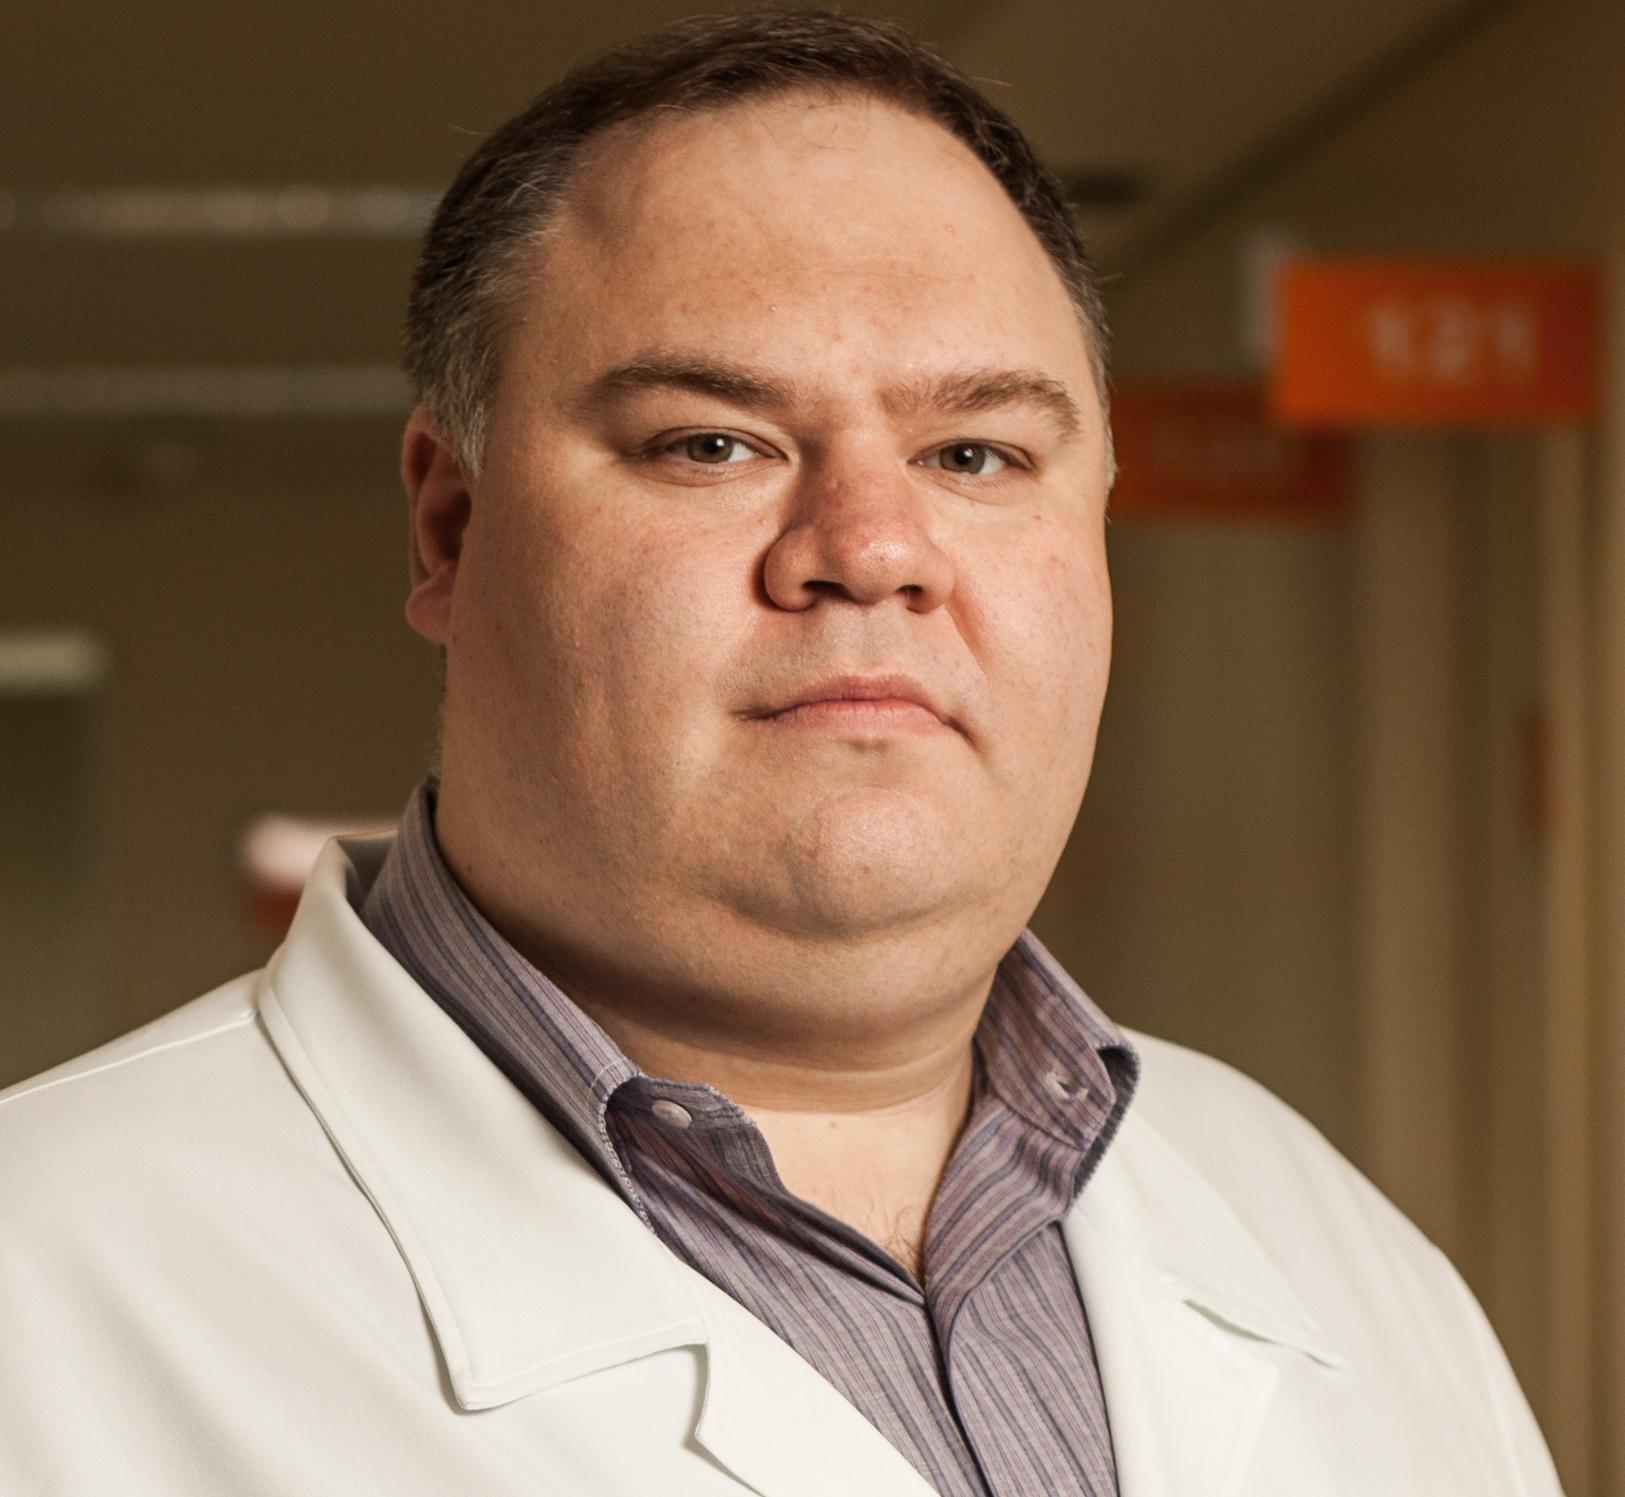 O rotariano e médico infectologista Leonardo Weissmann